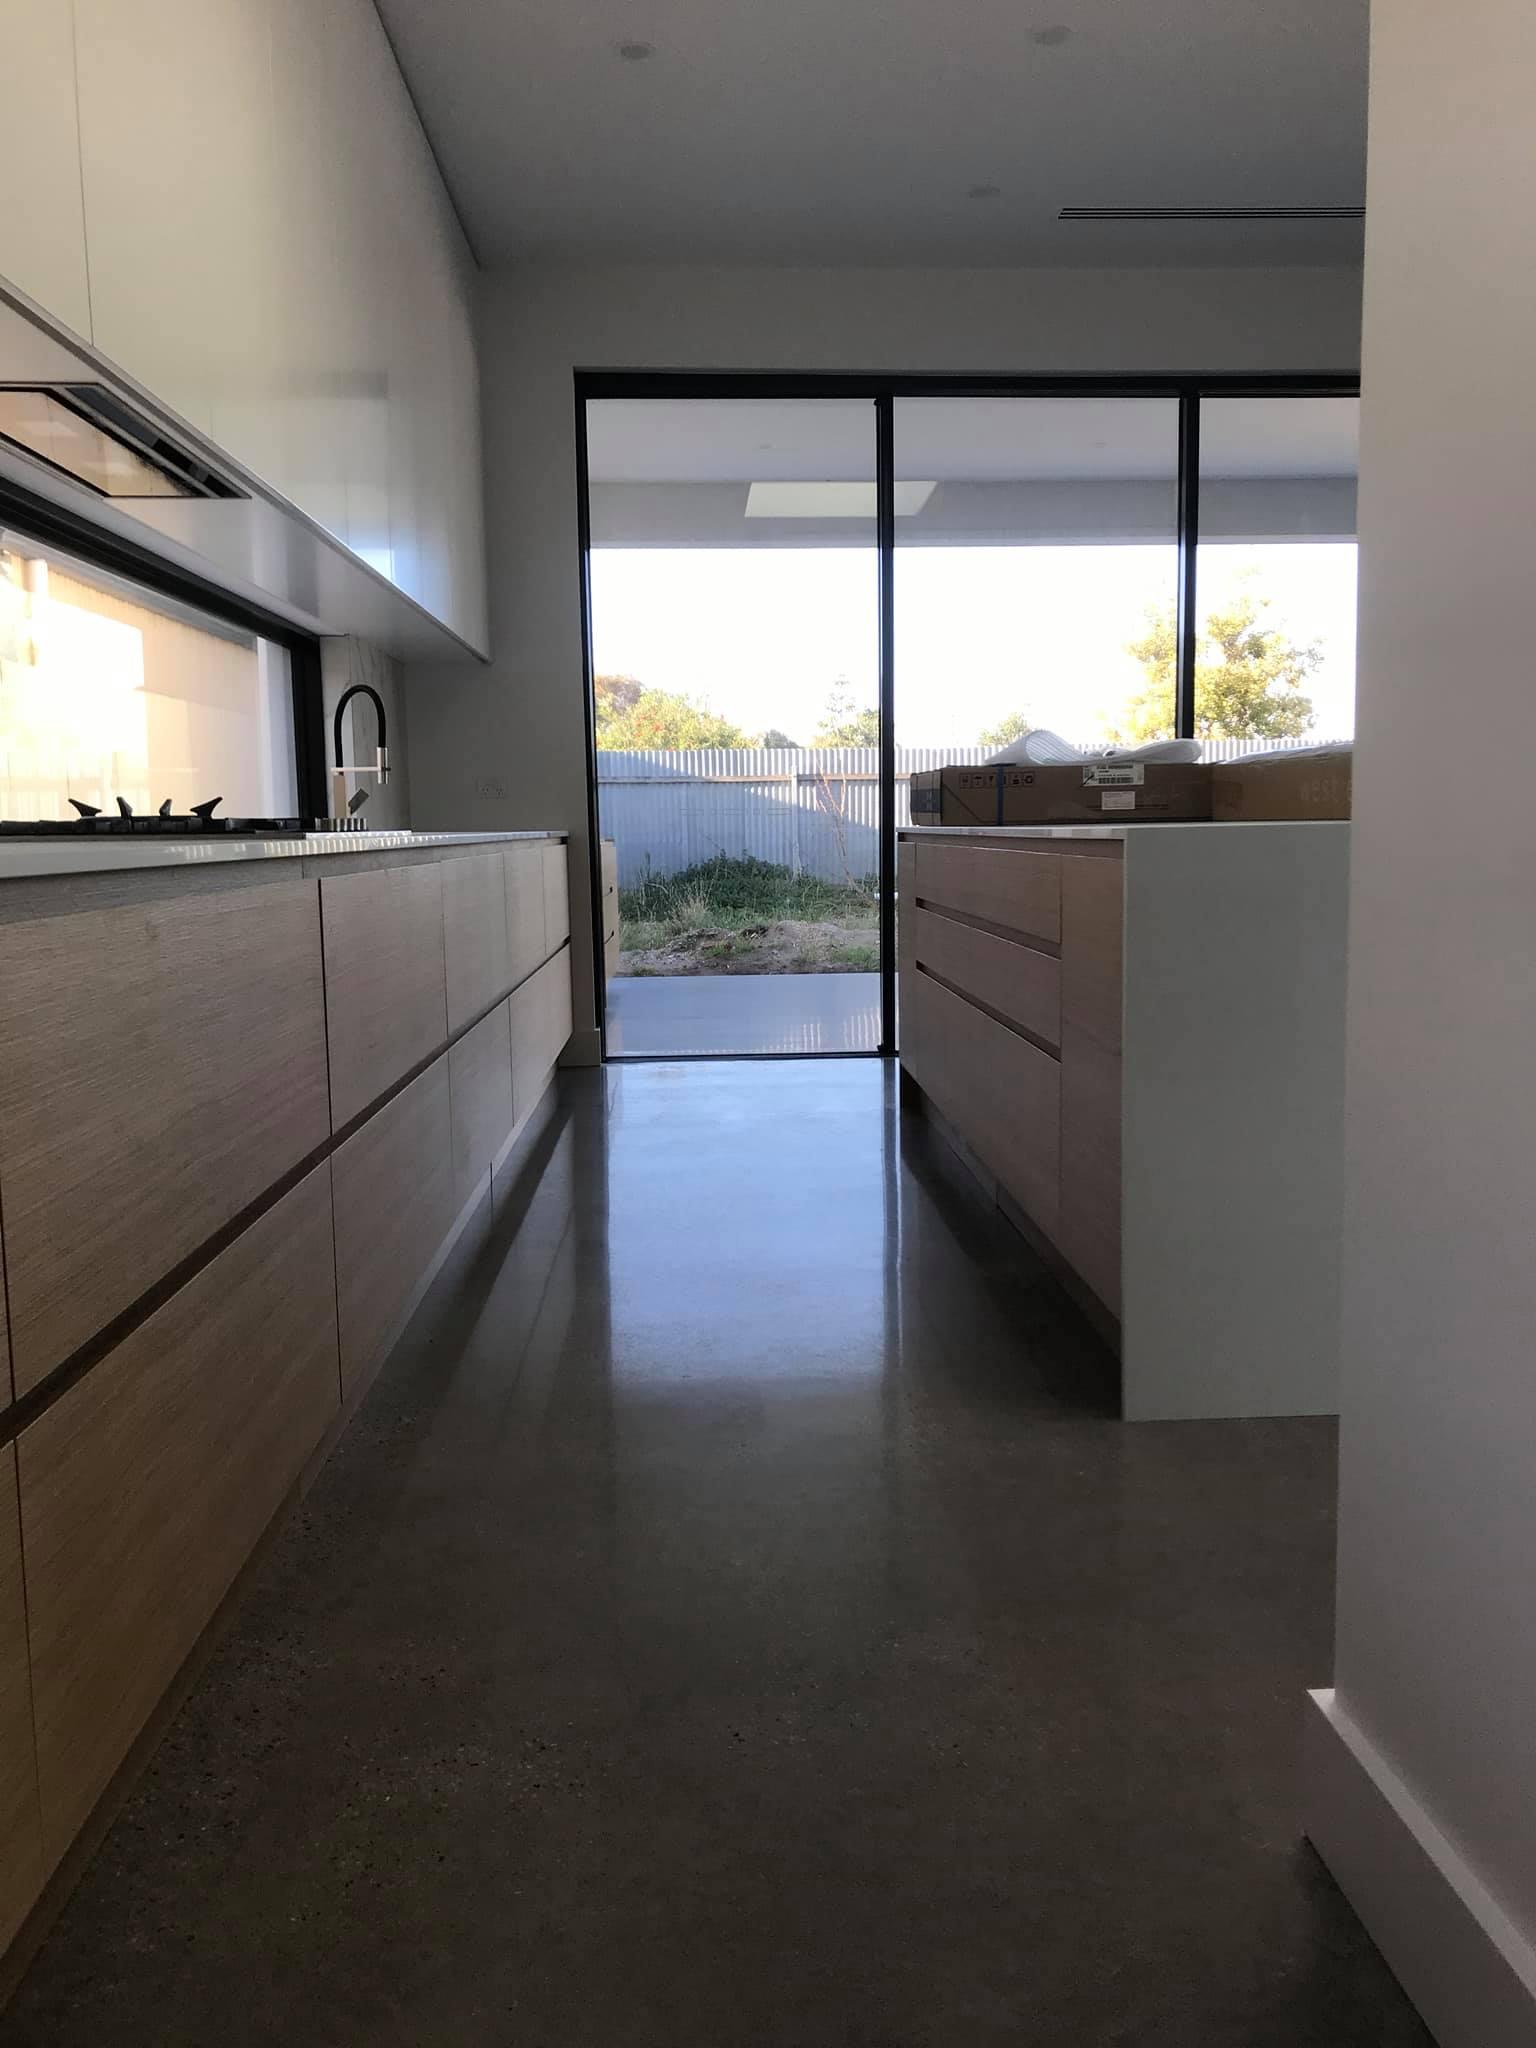 Full exposed kitchen floor